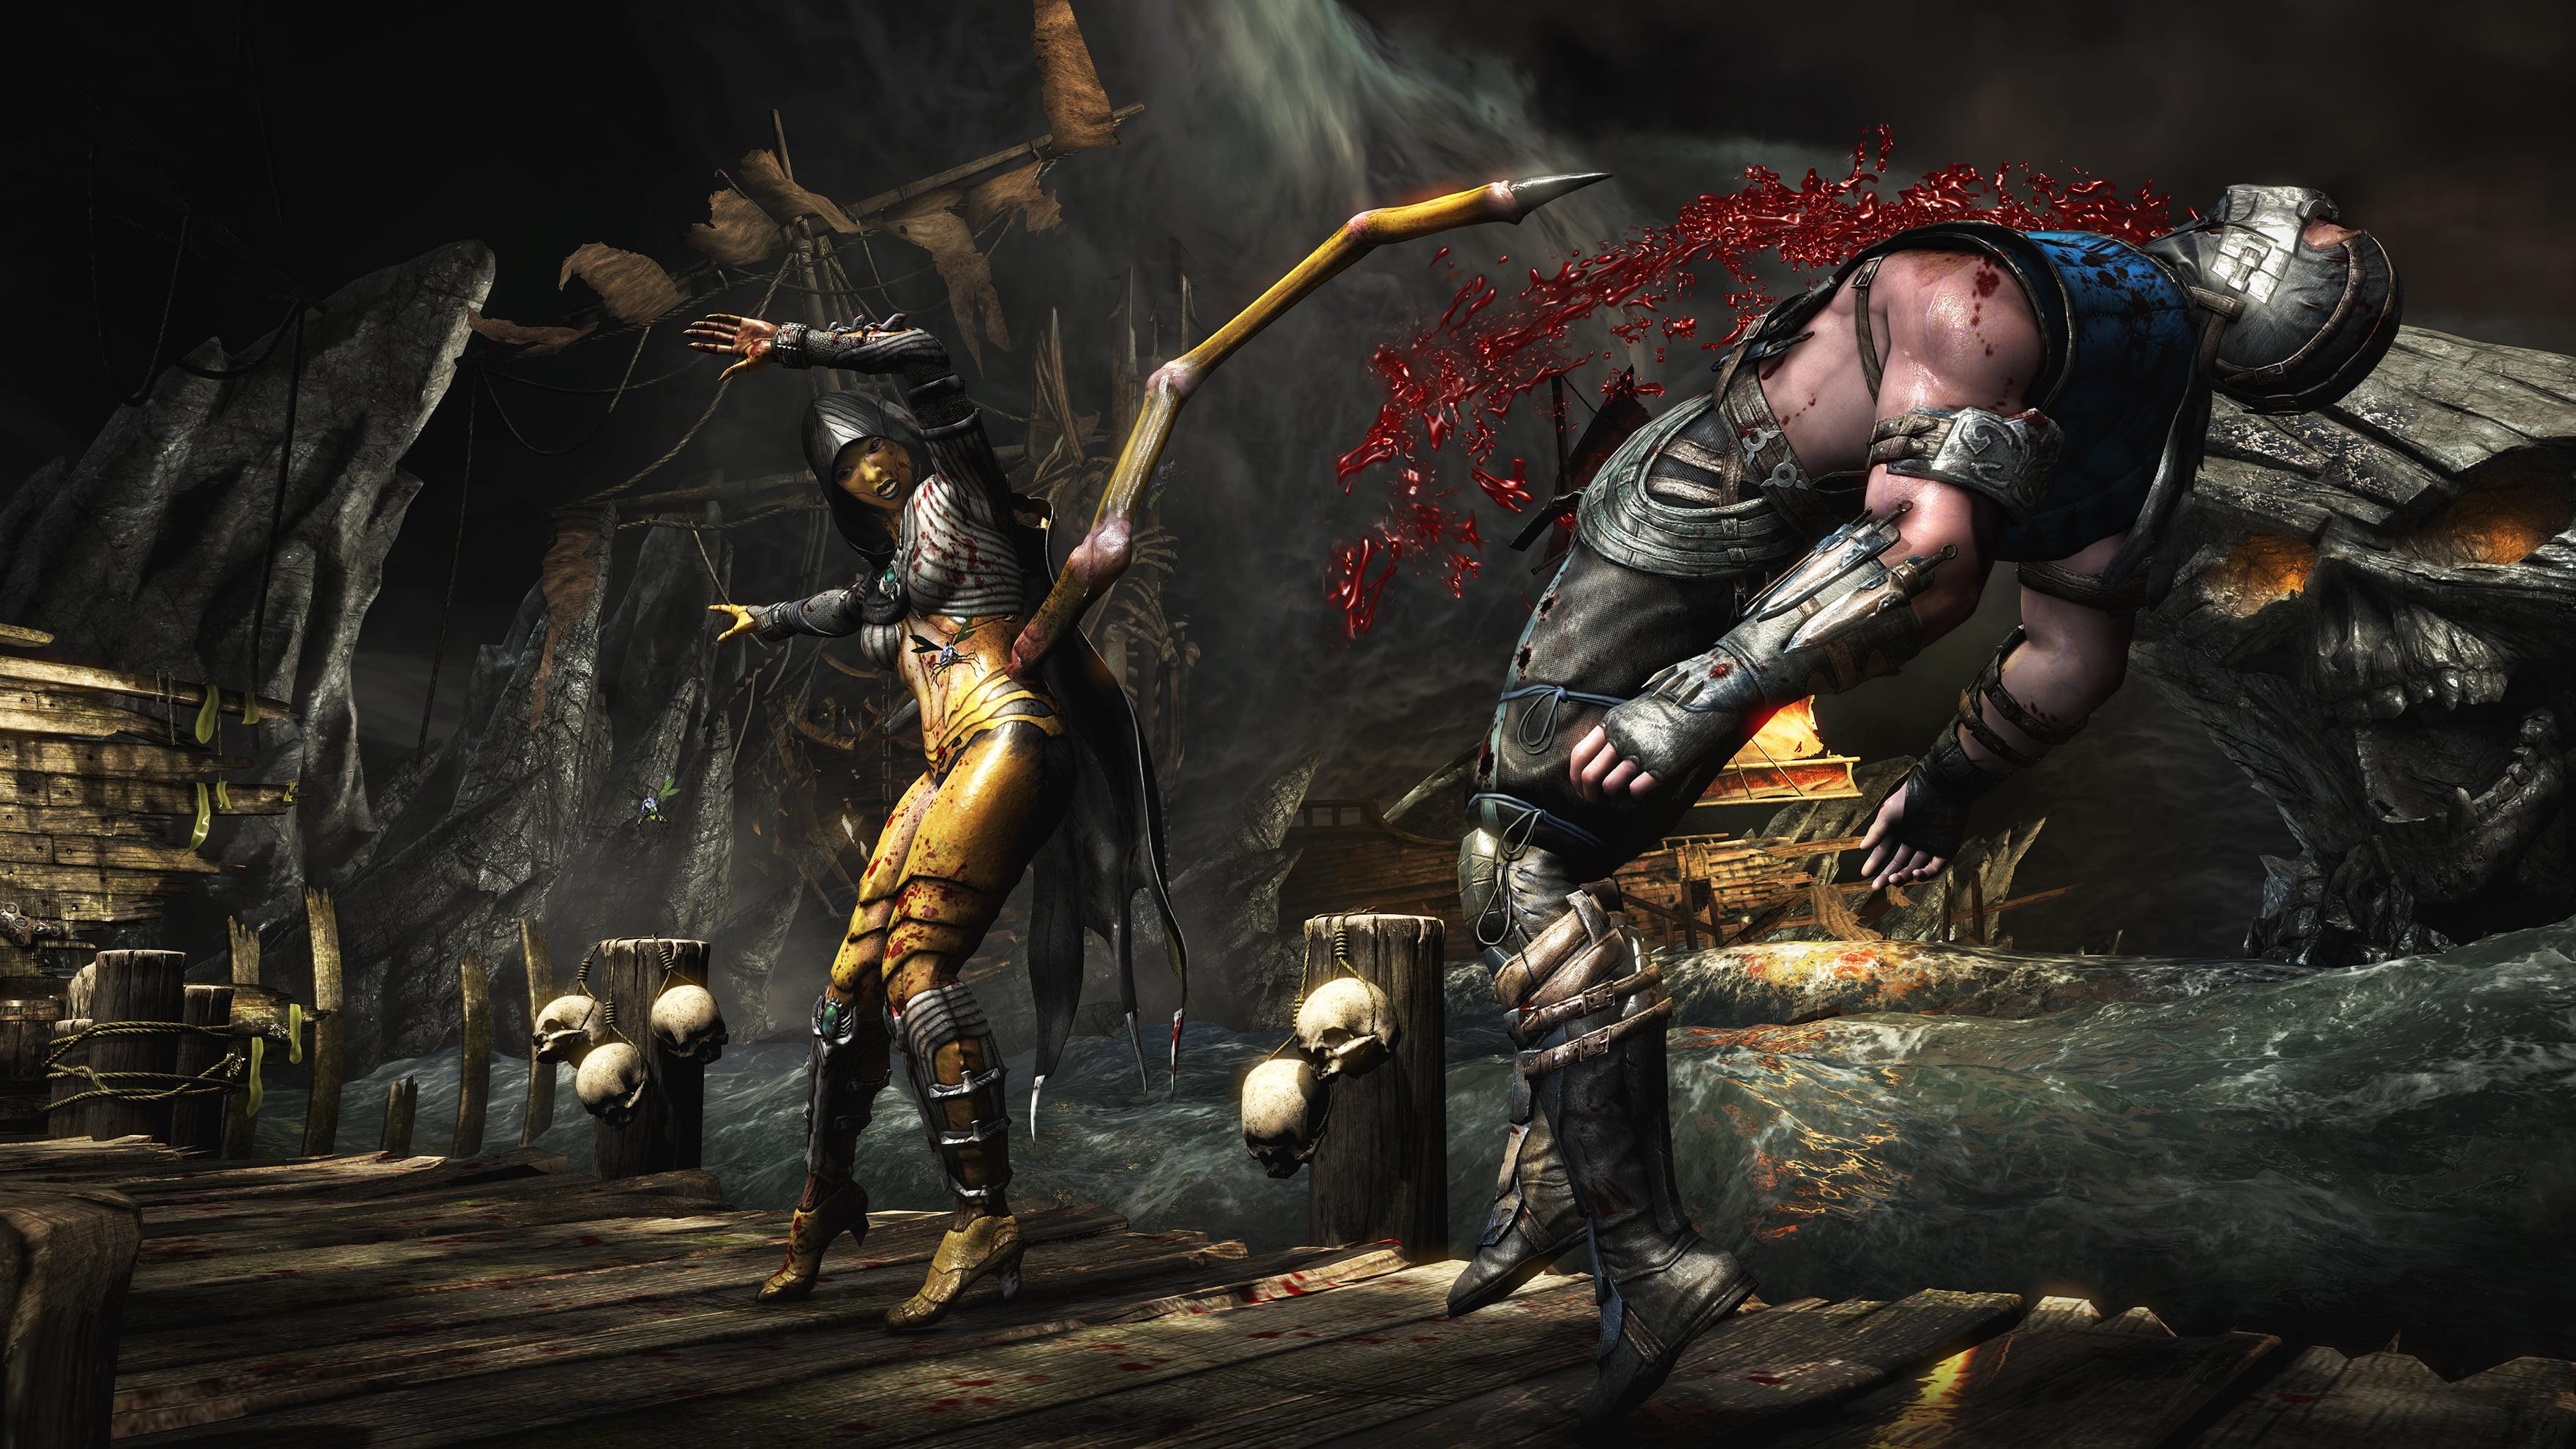 Photo of New Mortal Kombat X Trailer Reveals 4 New Characters